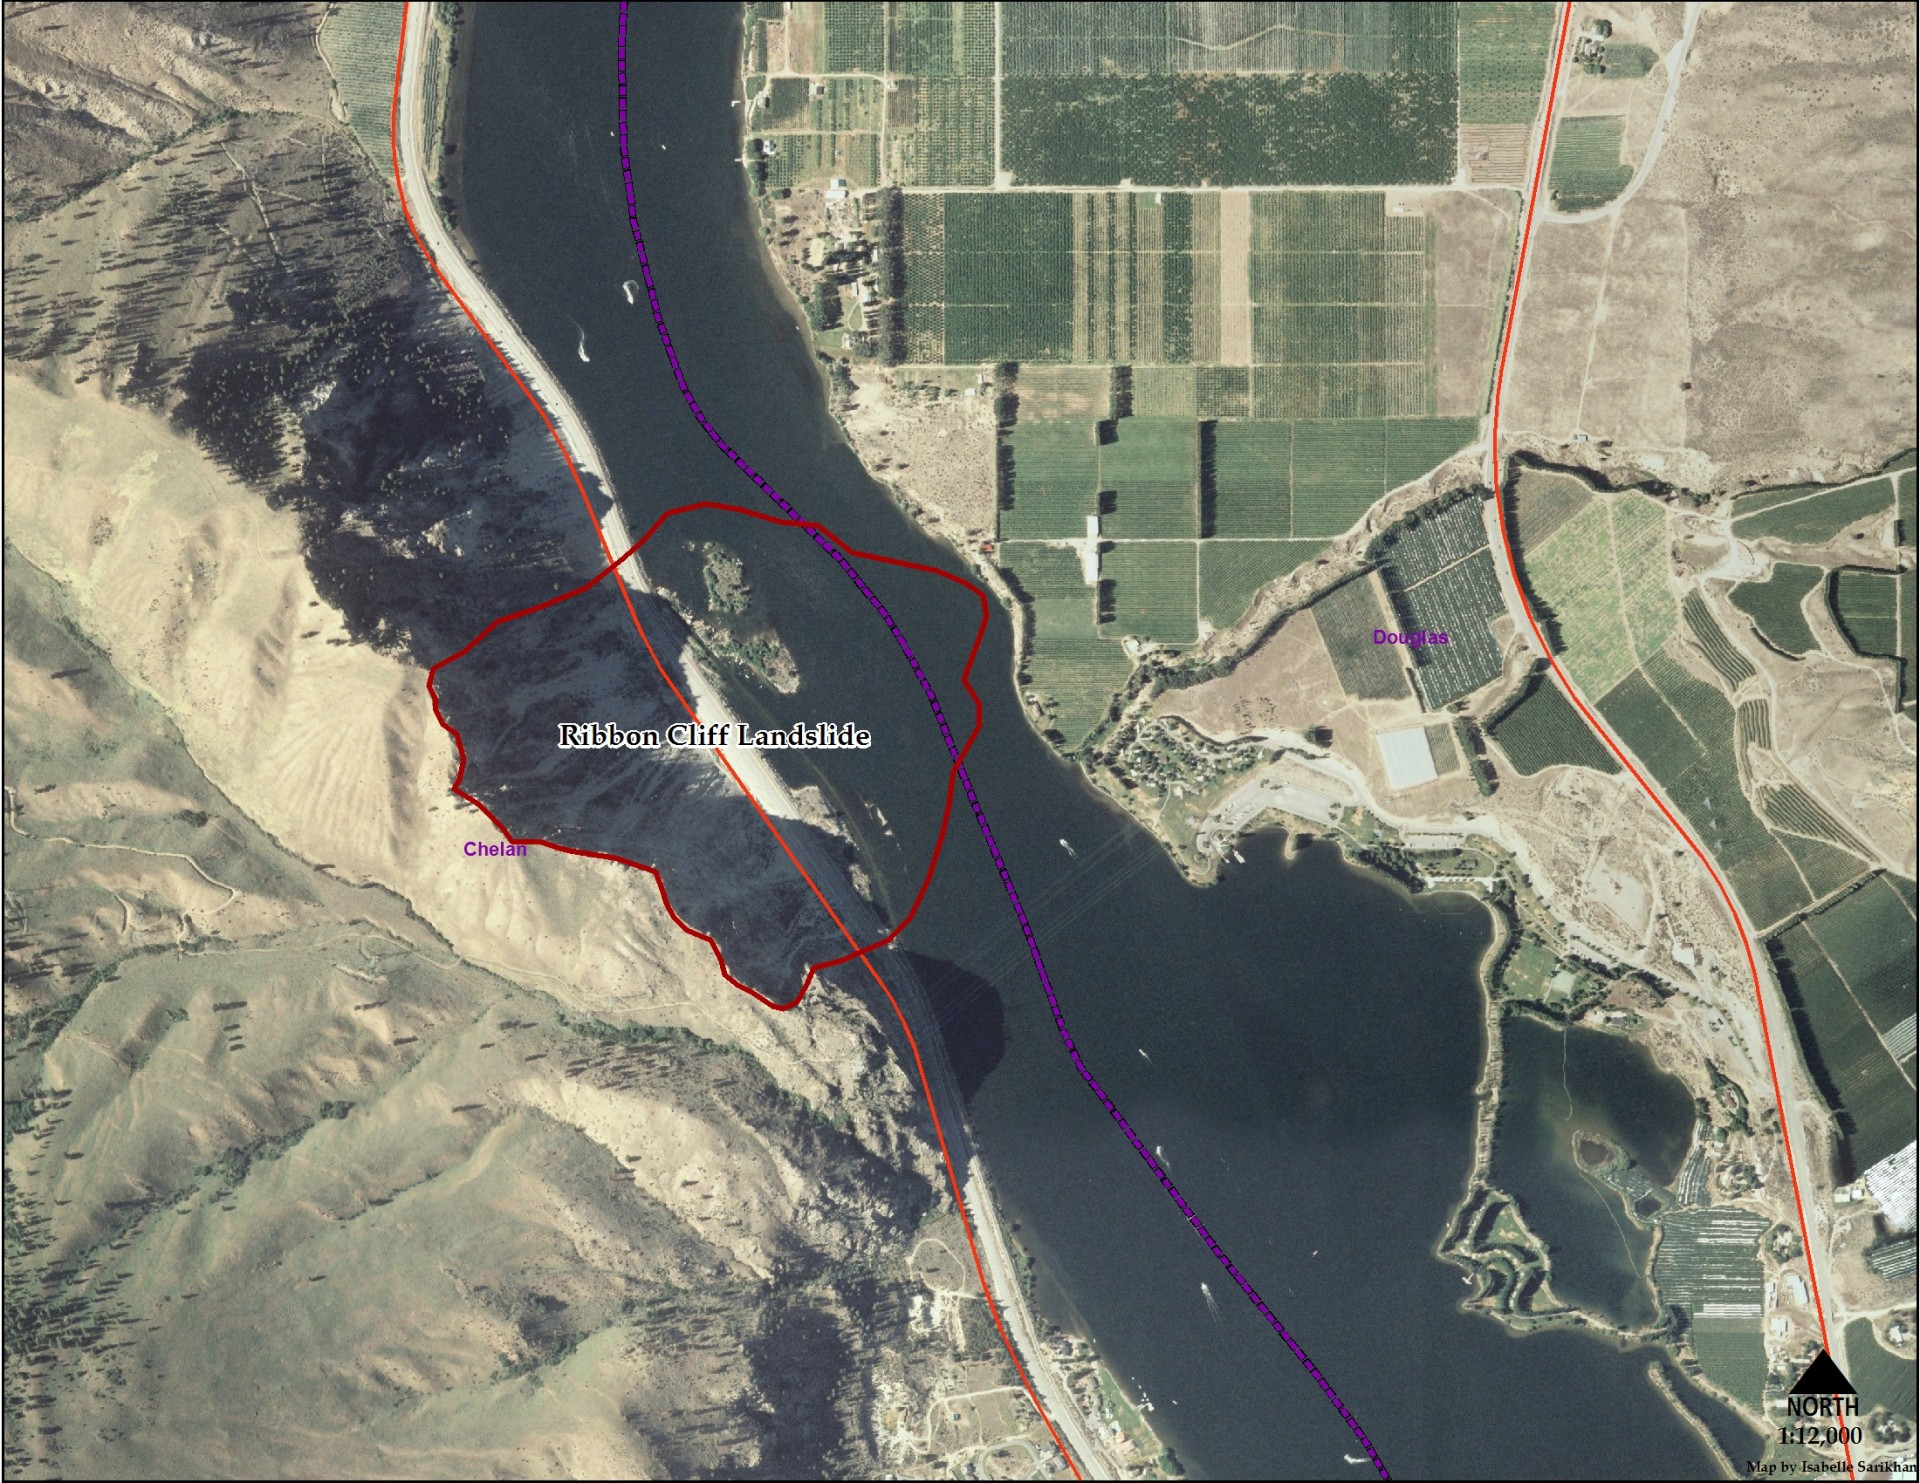 Best Places to Visit in Washington State   Ribbon Cliff Landslide